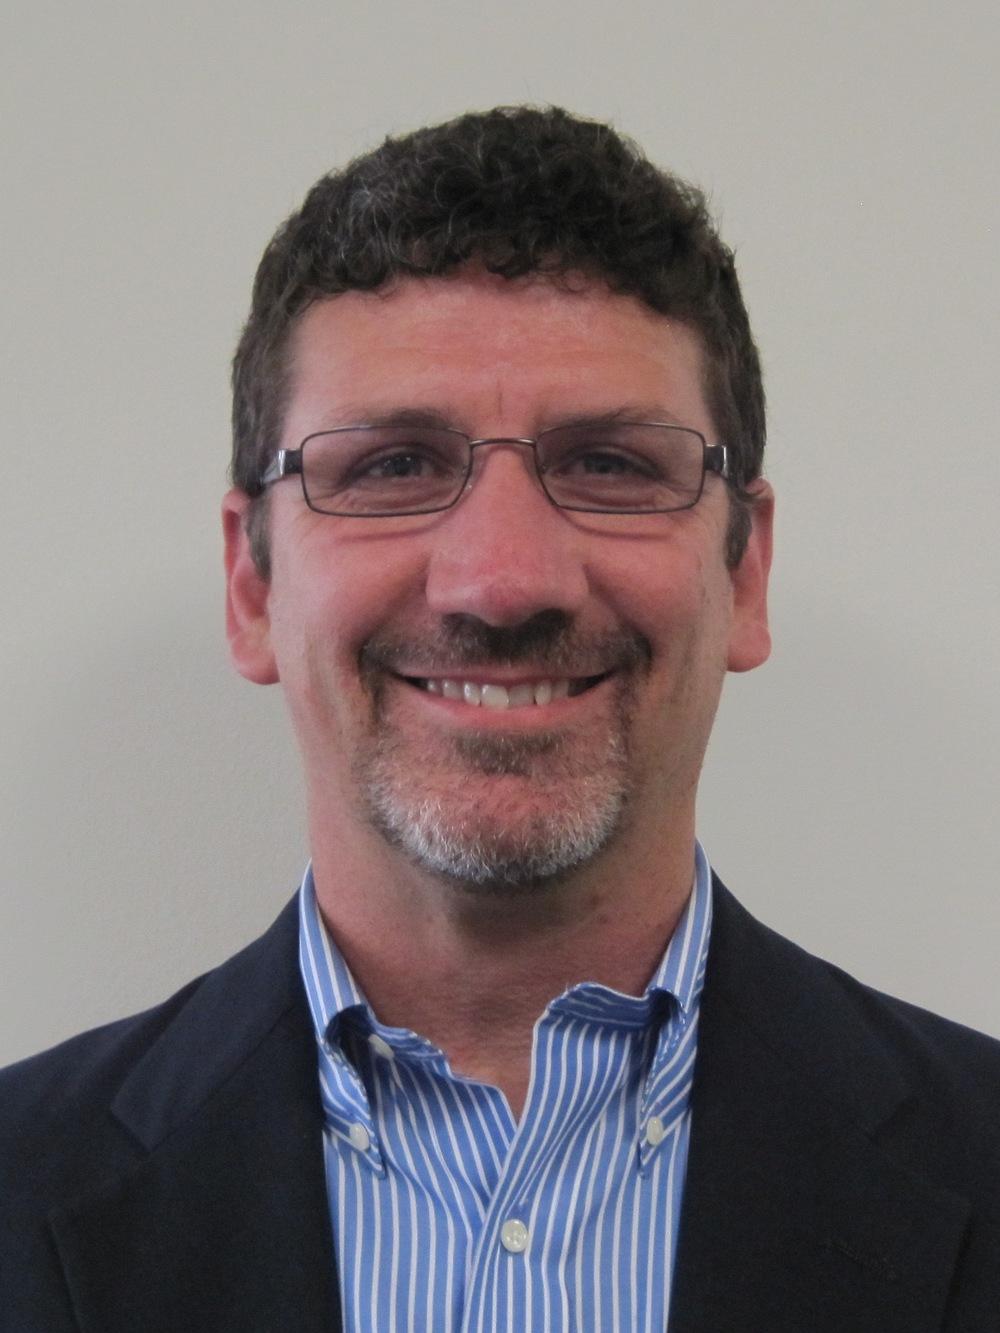 Michael Coram